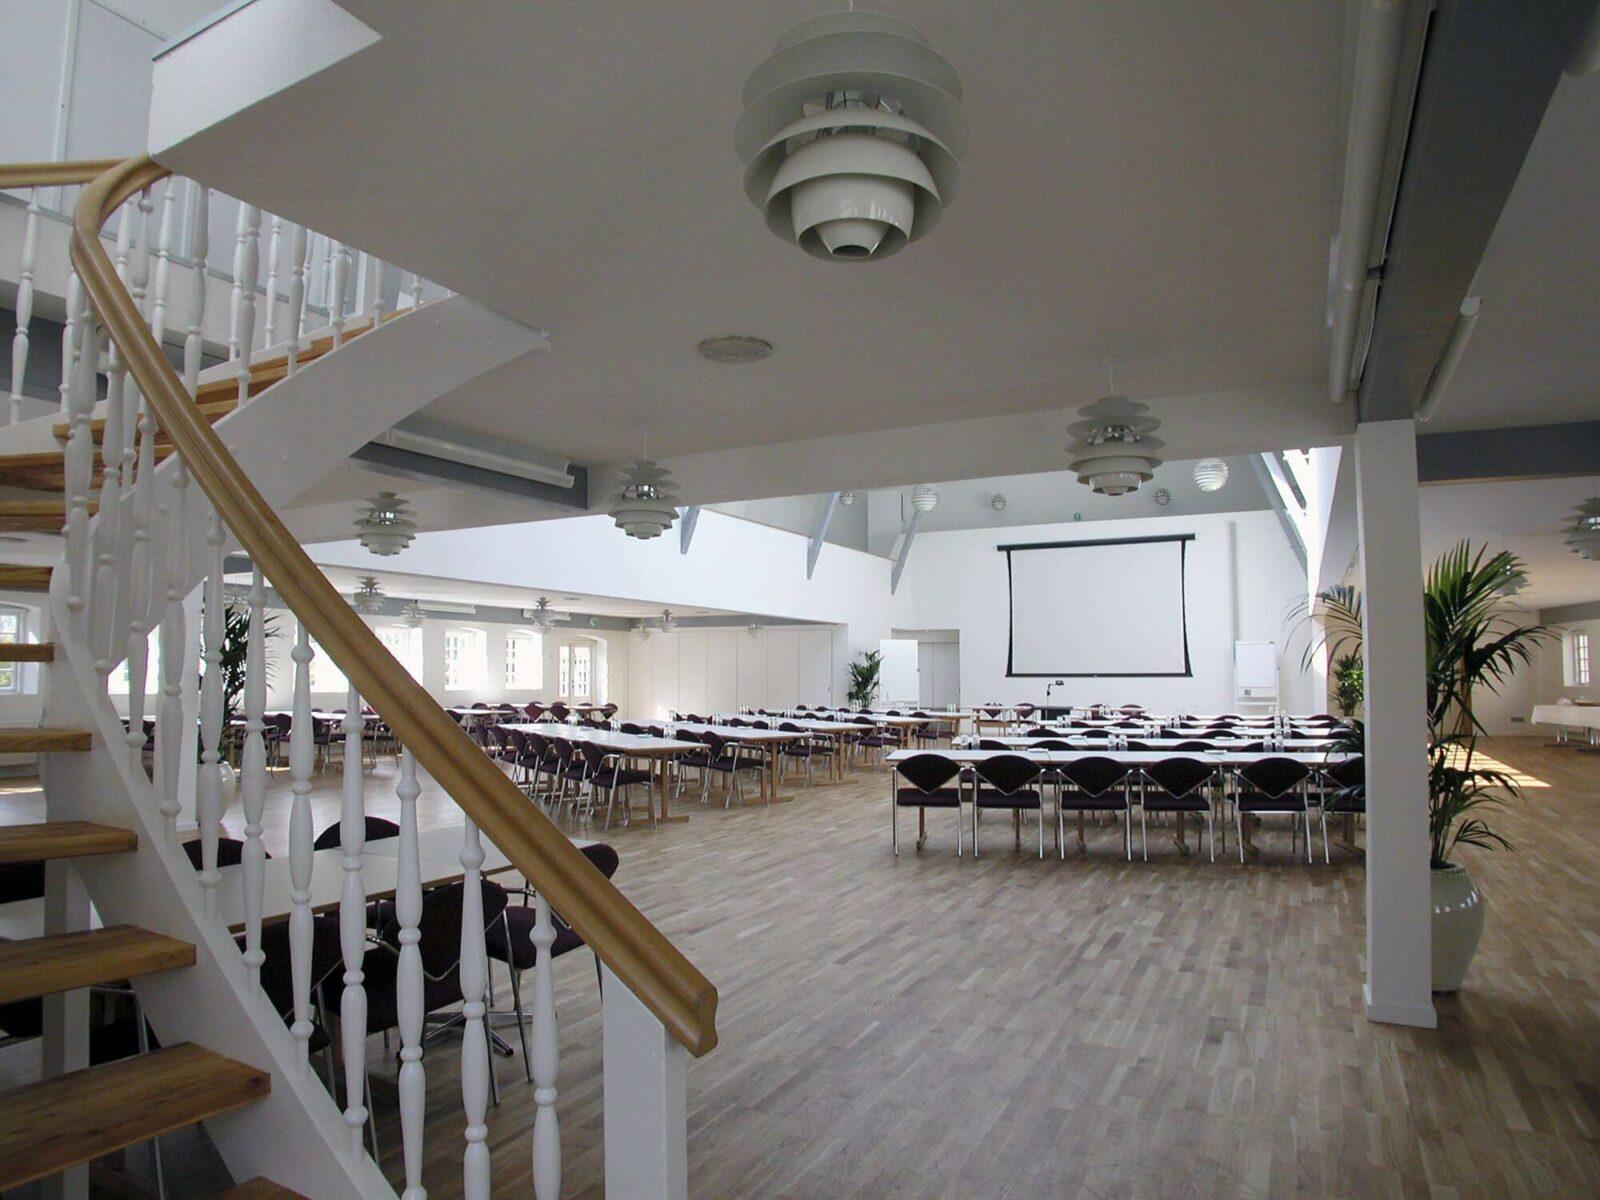 konference salen